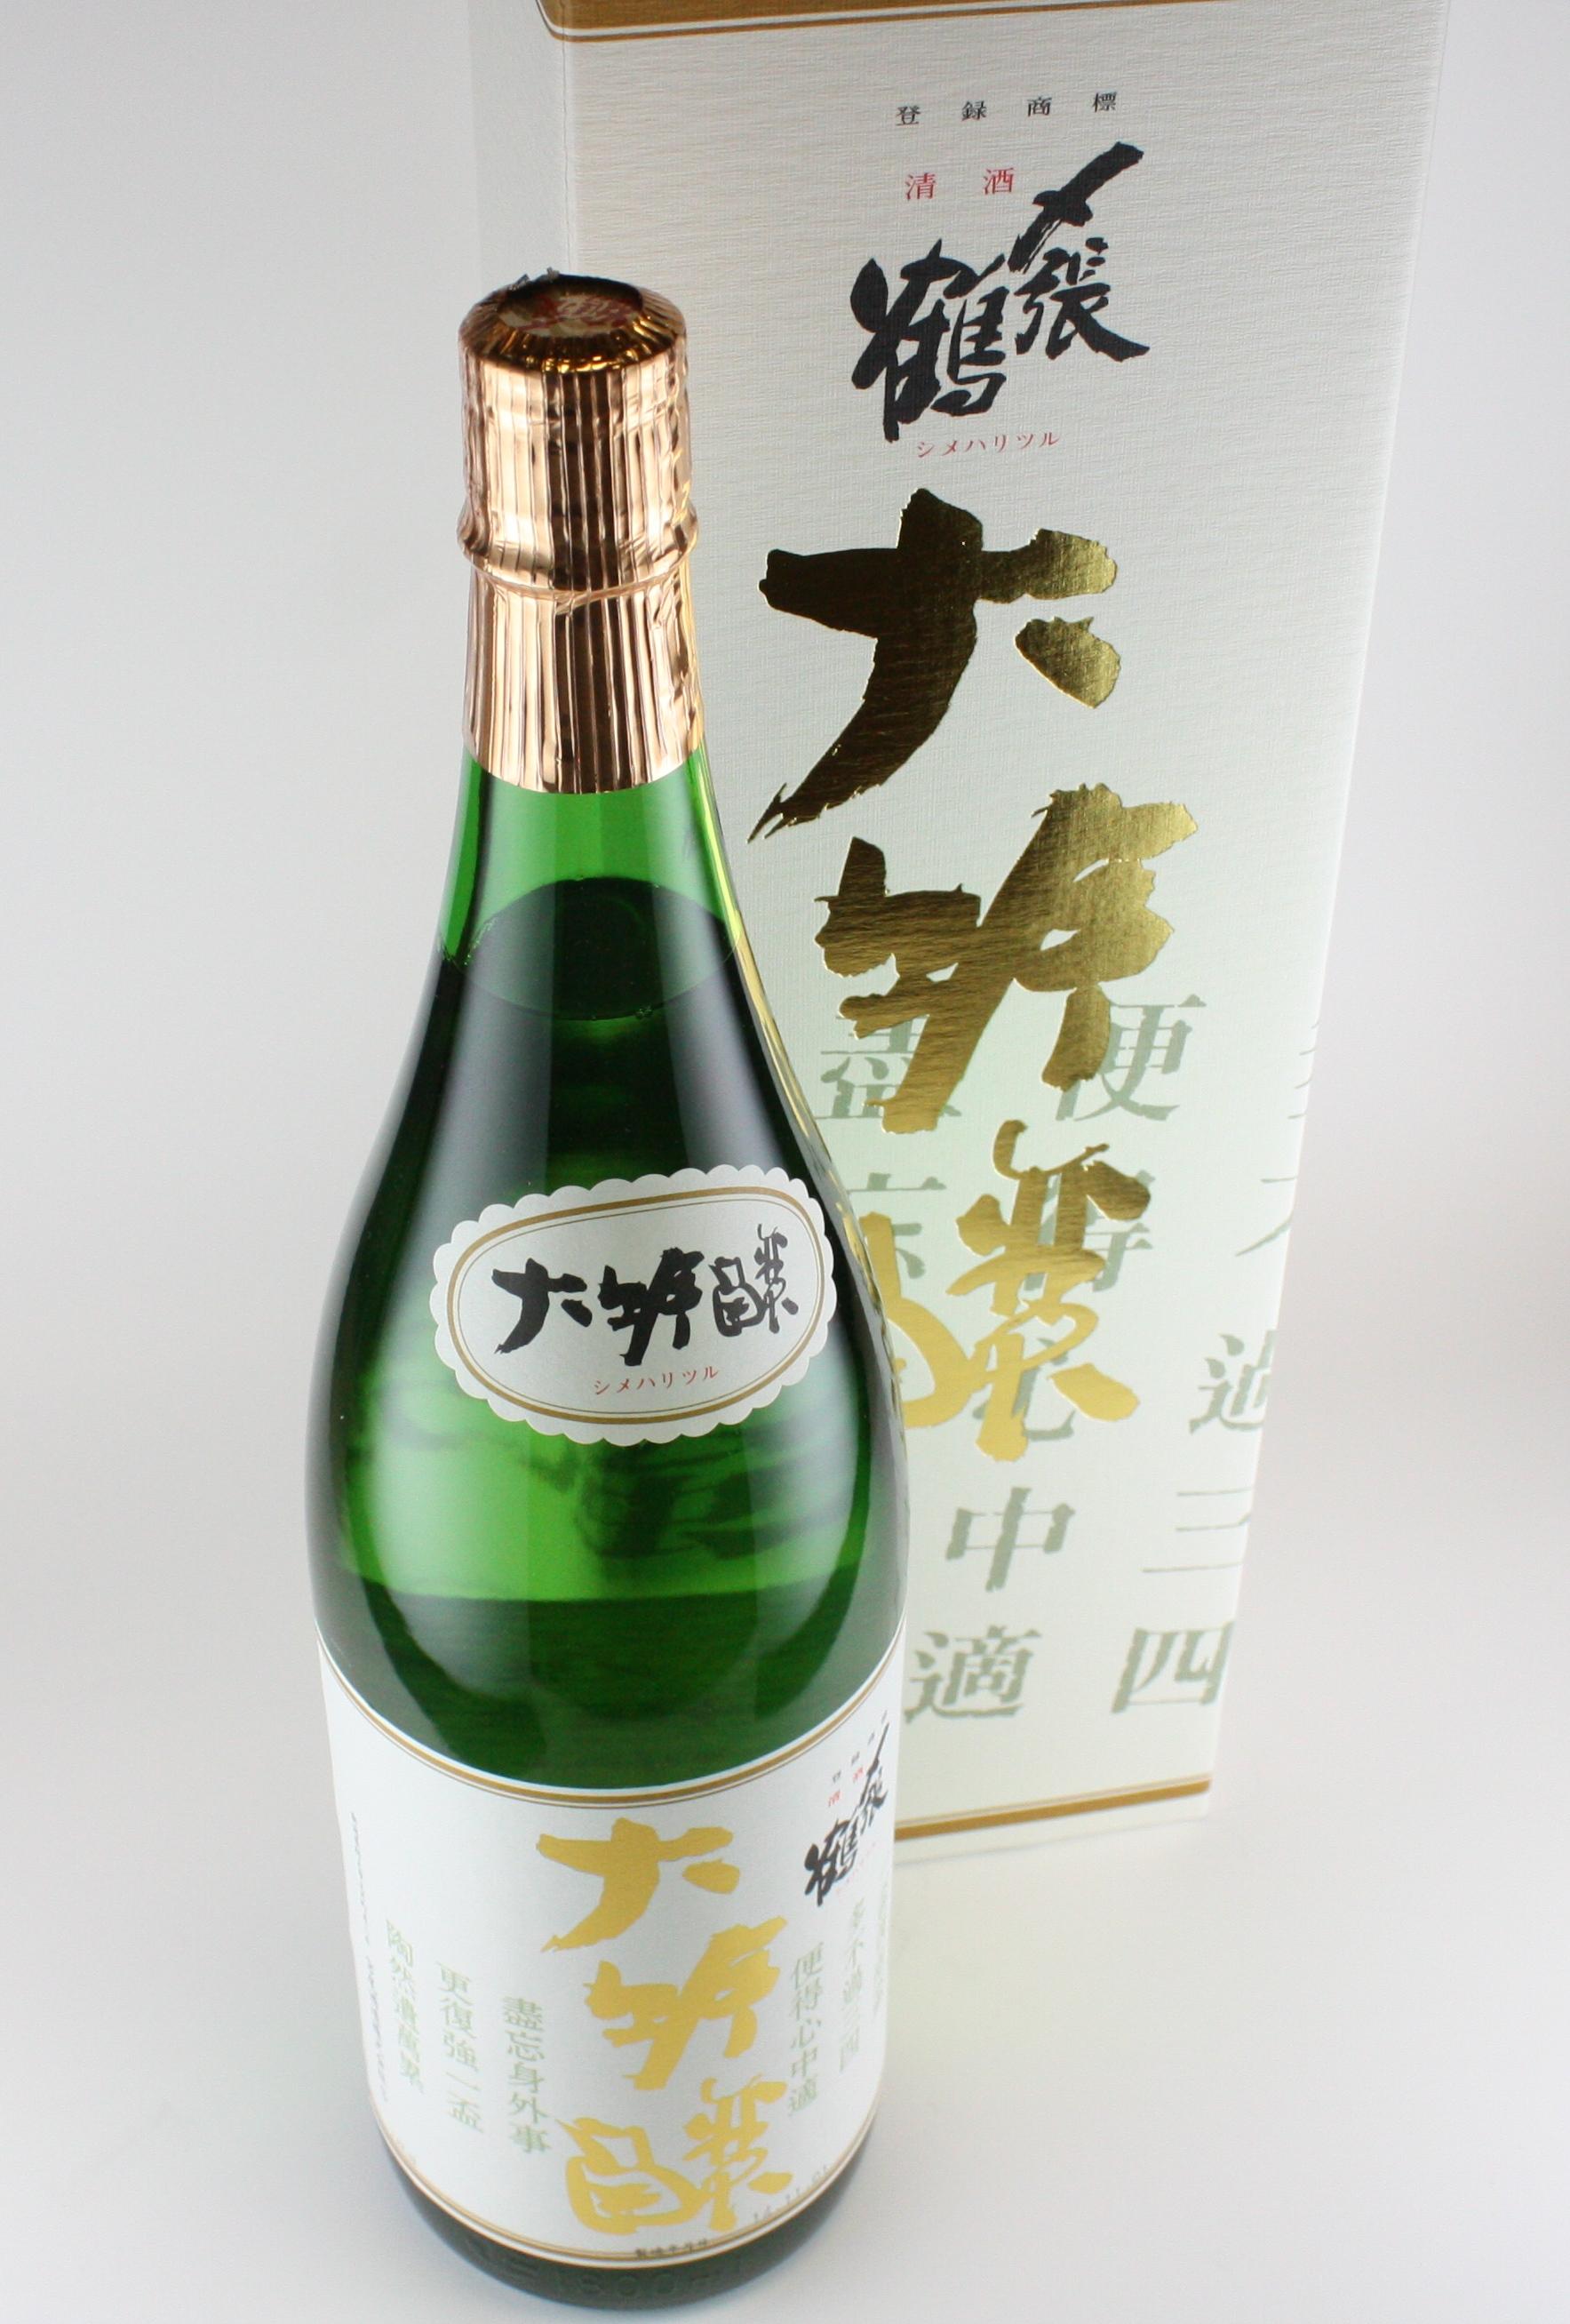 〆張鶴 金ラベル 大吟醸 山田錦 1800ml 【新潟/宮尾酒造】